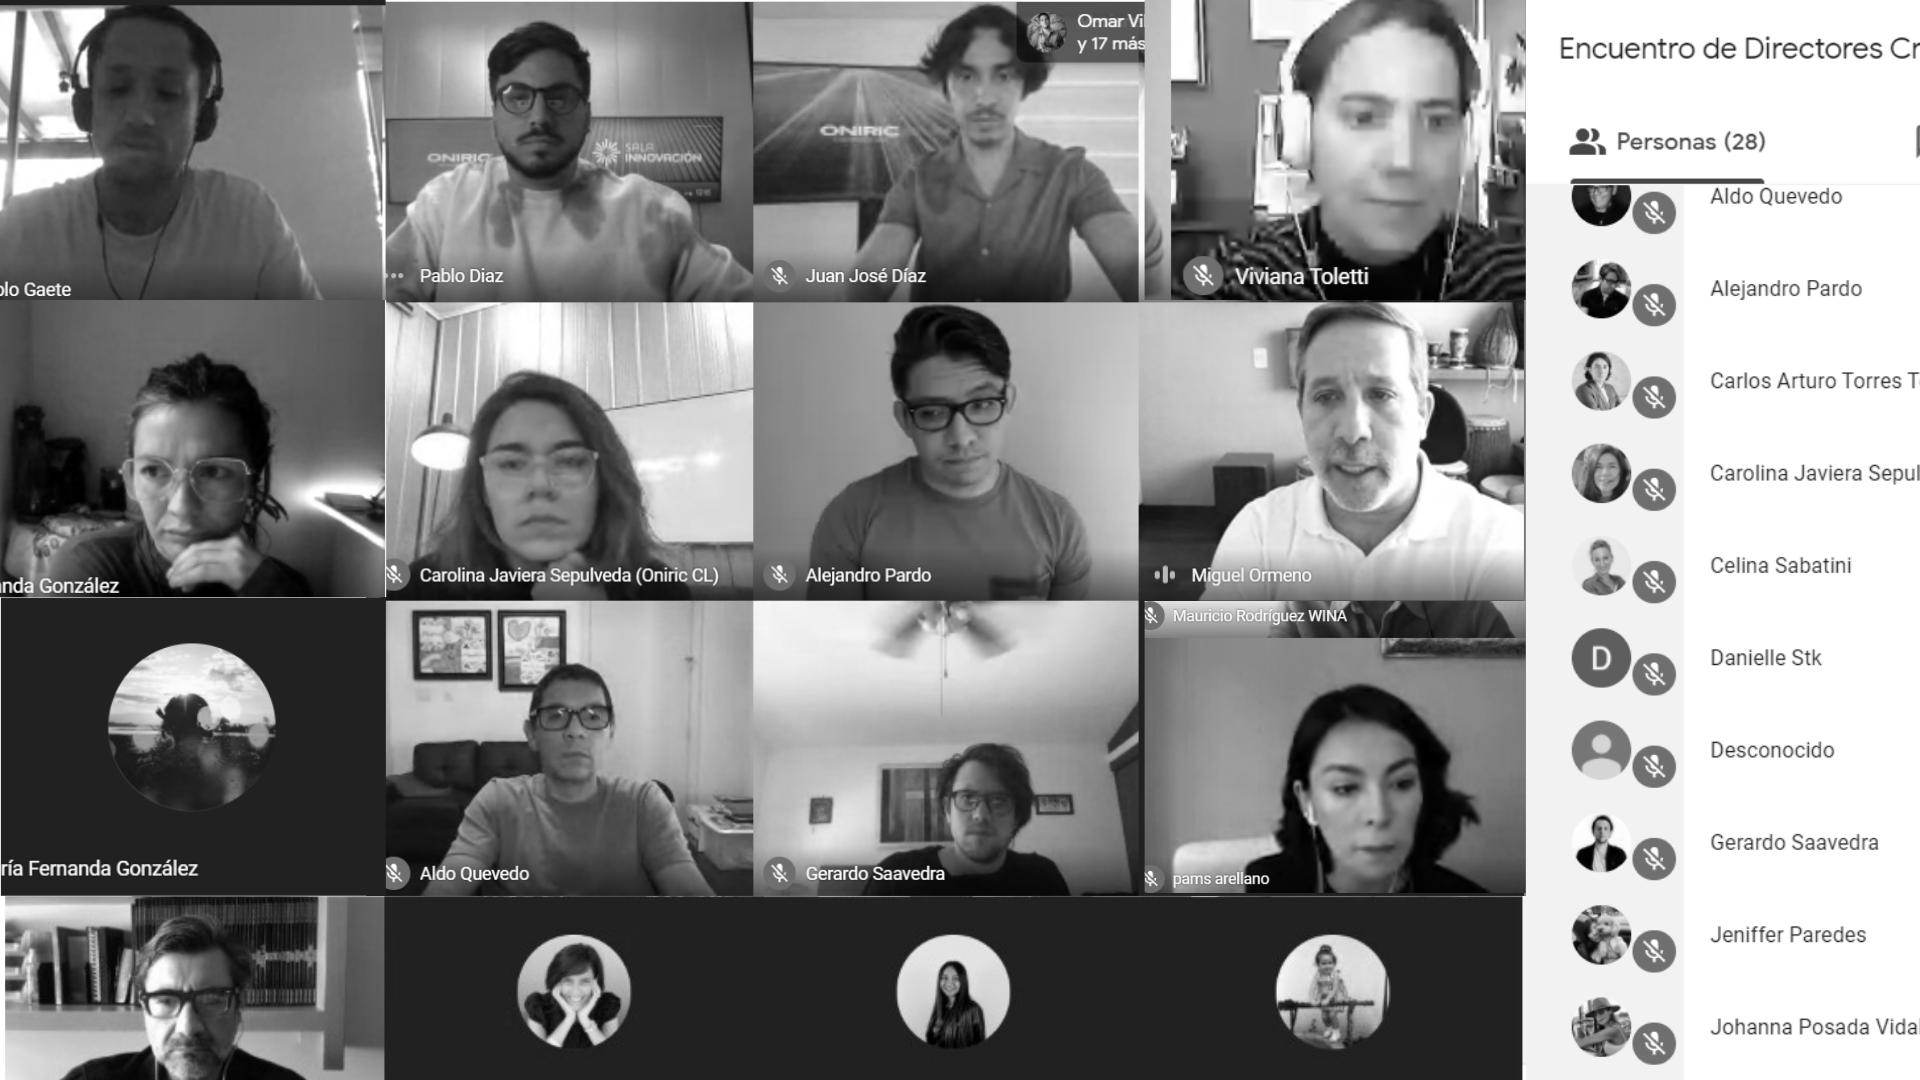 Constellation Network Online forum with creative directors